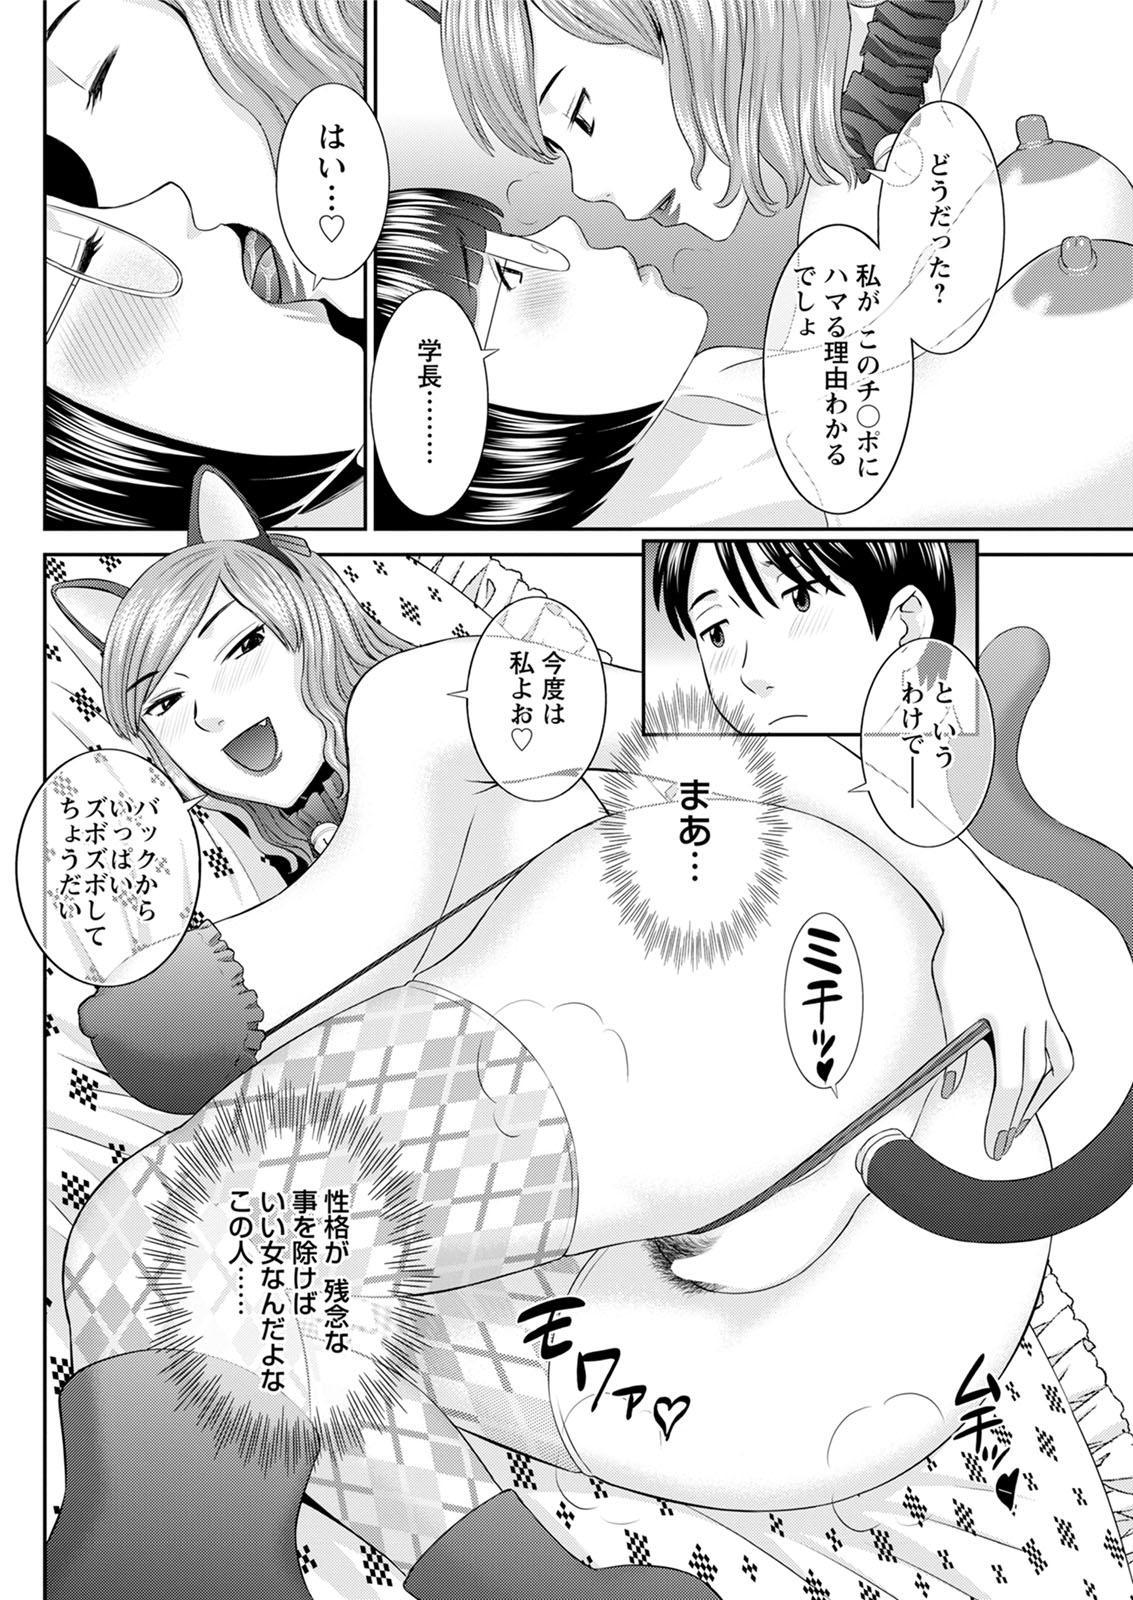 [Kawamori Misaki] Kaikan Hitotsuma Gakuen Ch. 1-6, 8-16 [Digital] 252